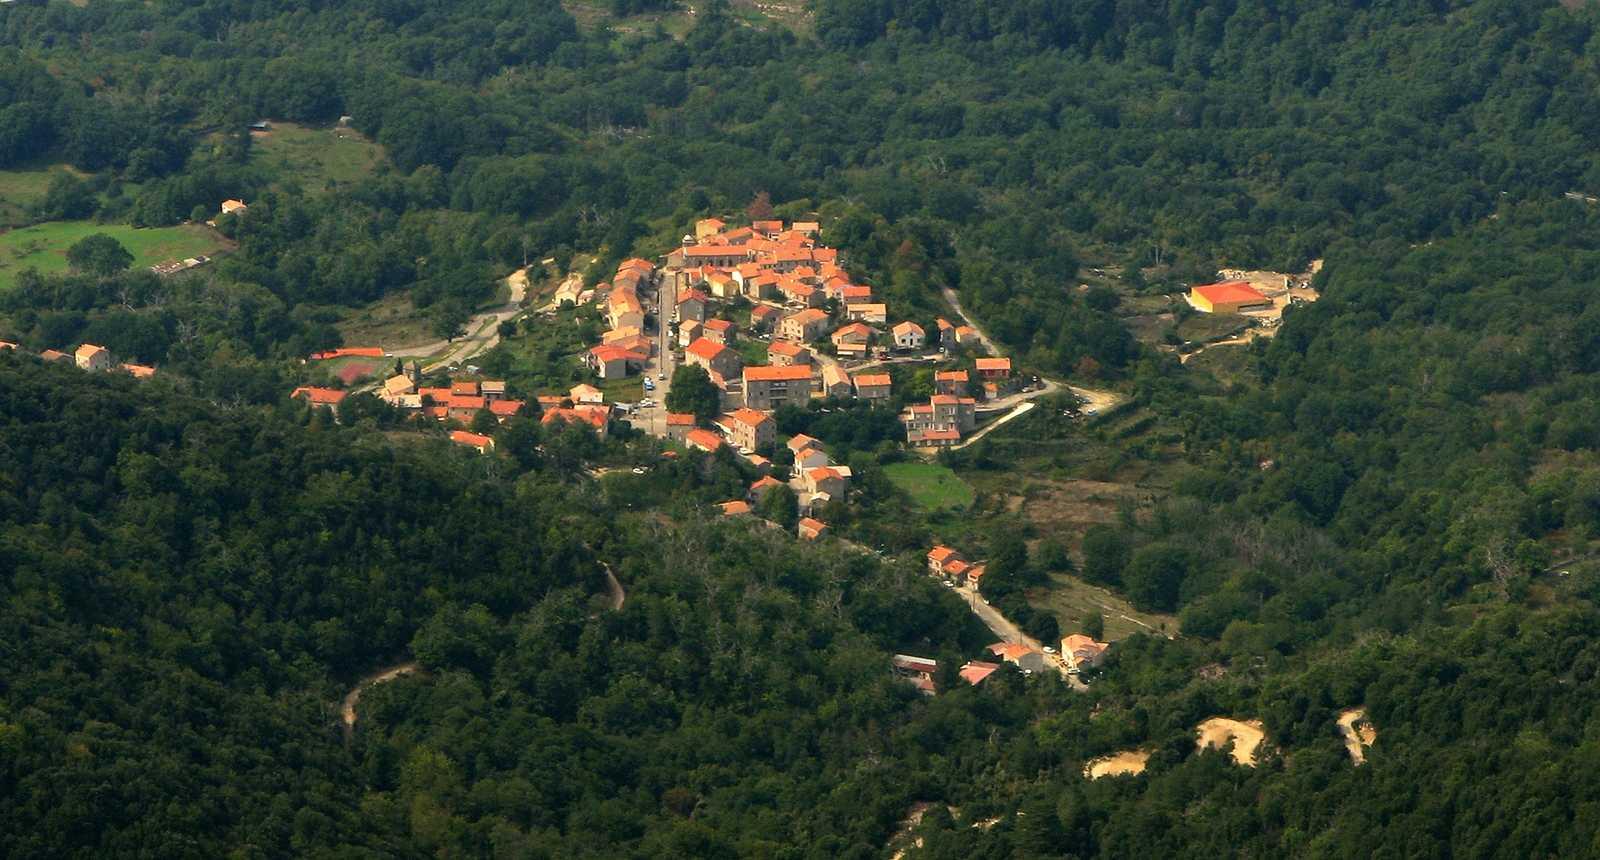 Le village de Cozzano, dans la forêt de Zicavo